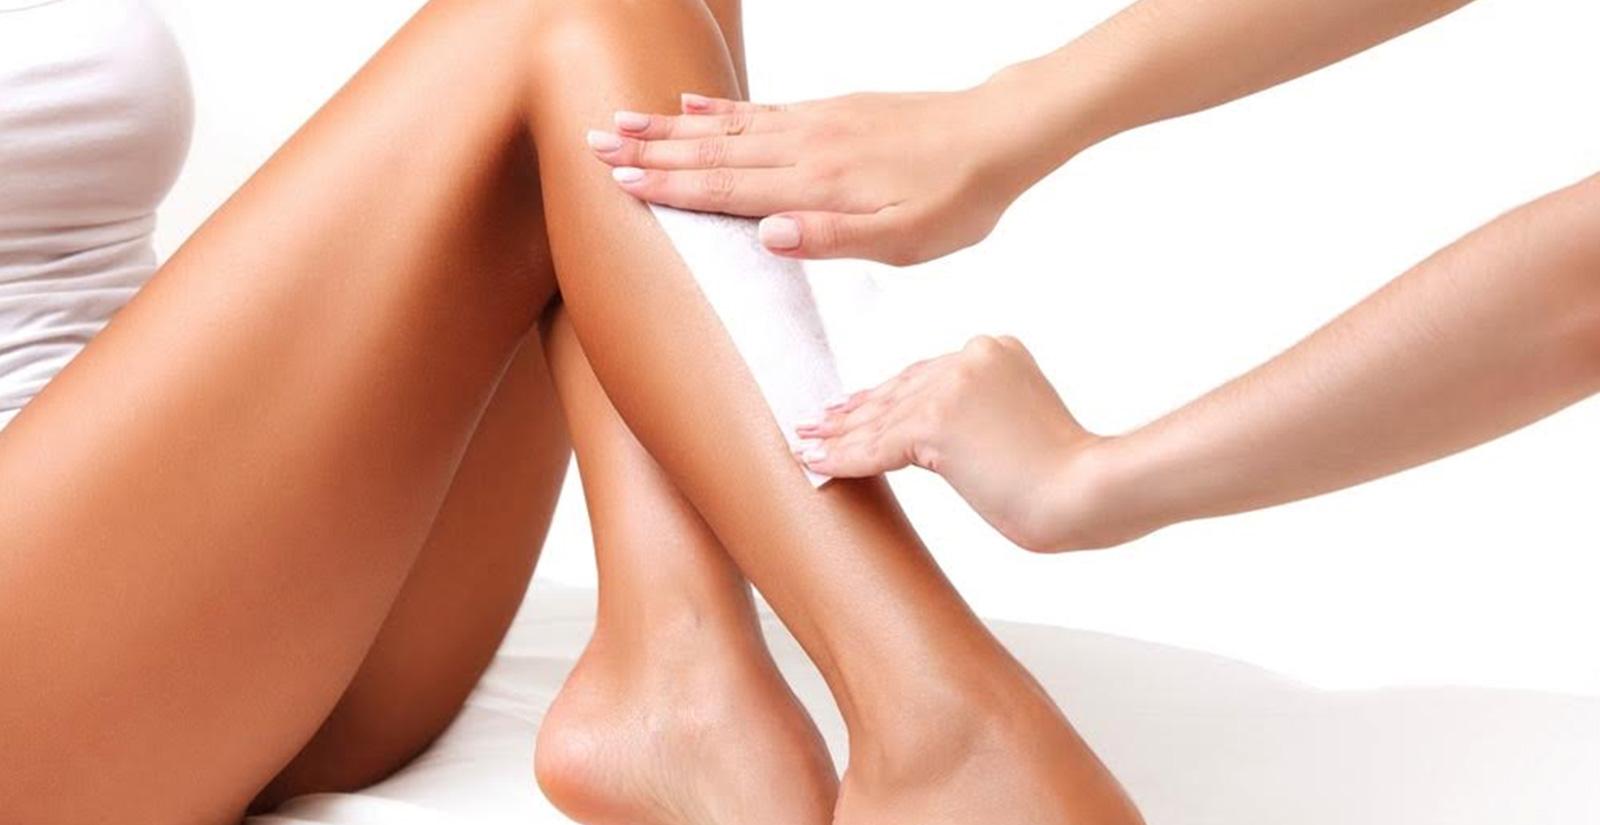 Leg waxing treatments